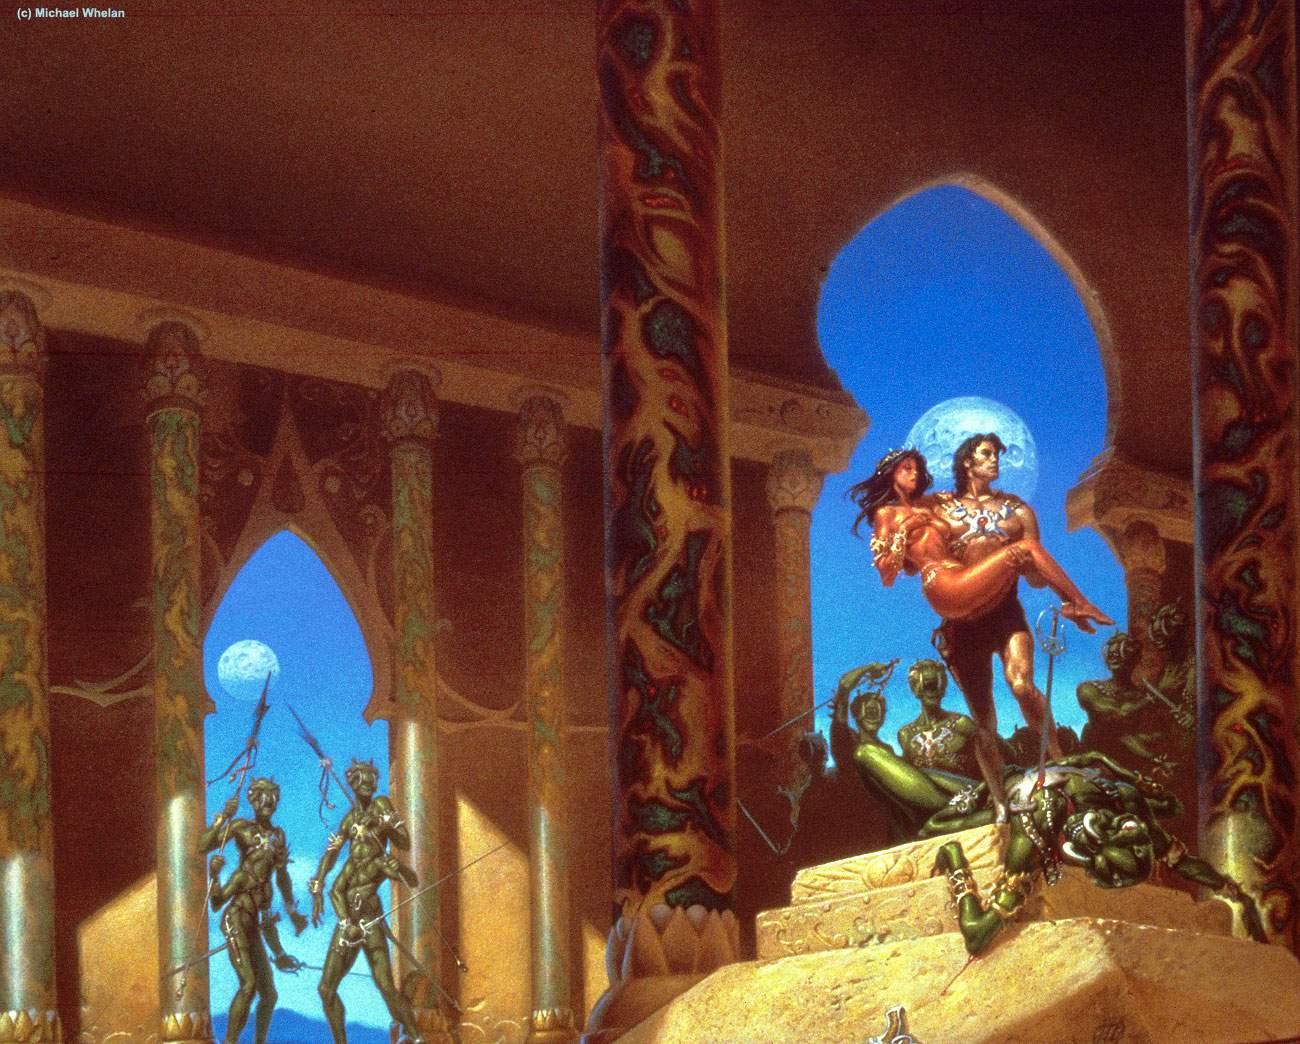 Princess of Mars (C) Michael Whelan